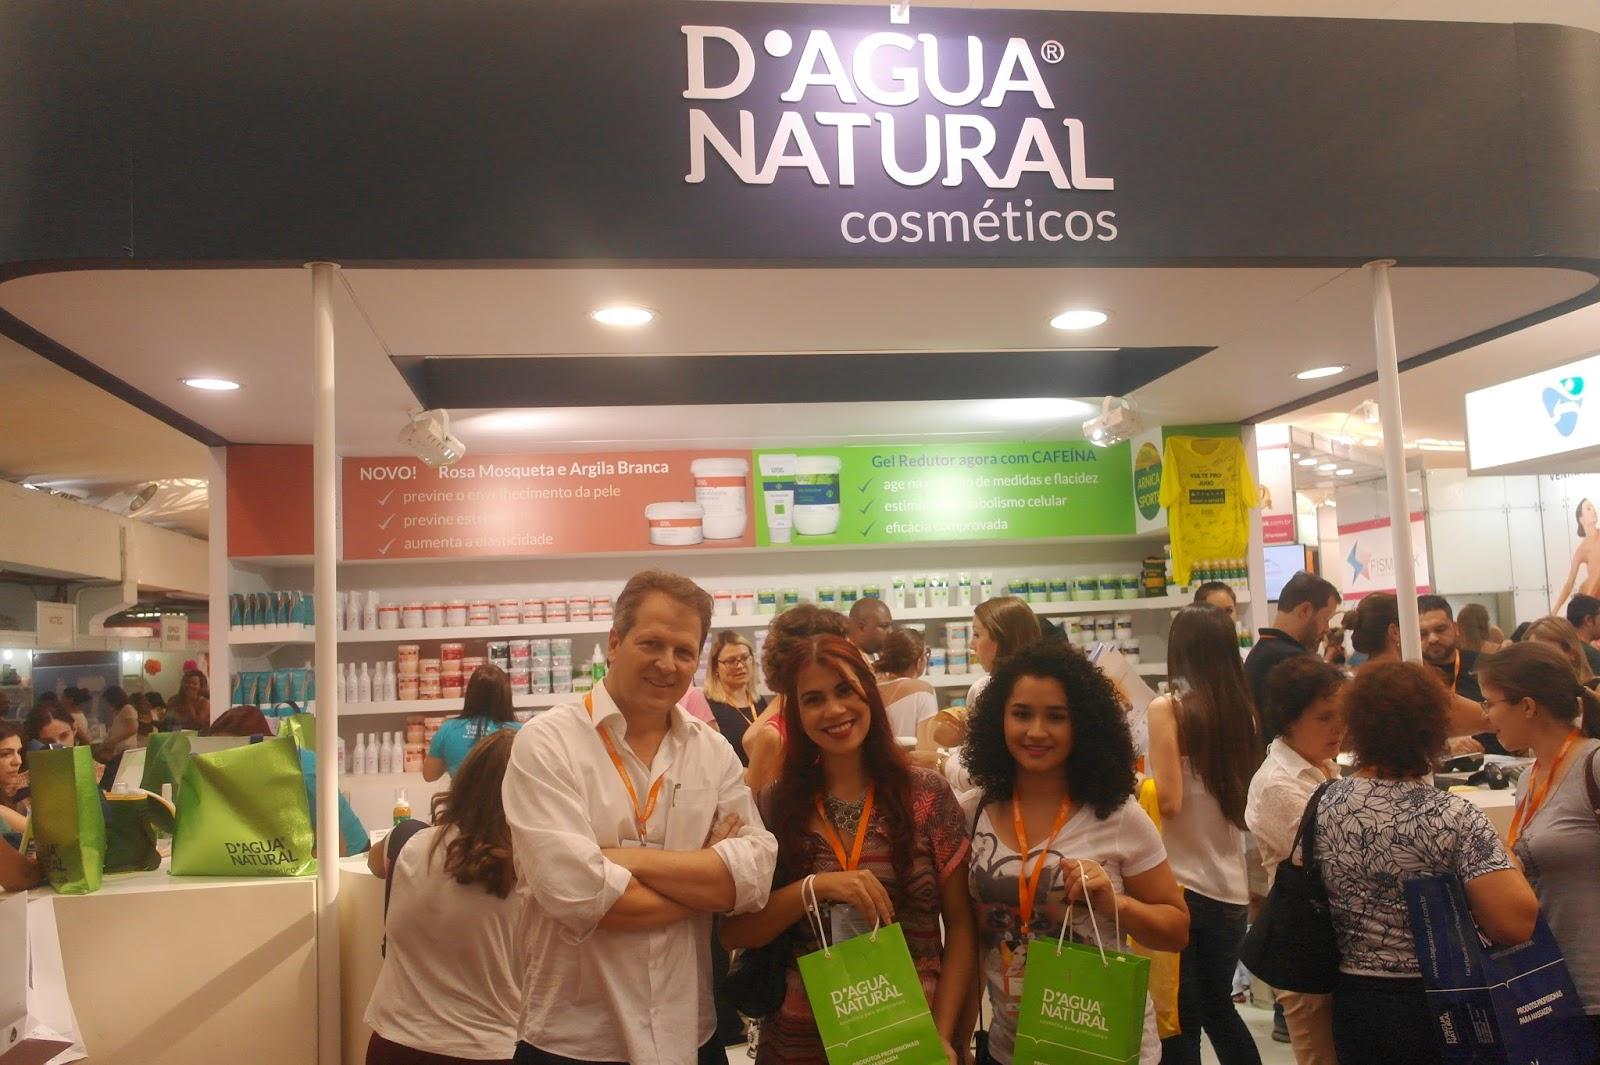 Dagua natural blog estilo modas e manias